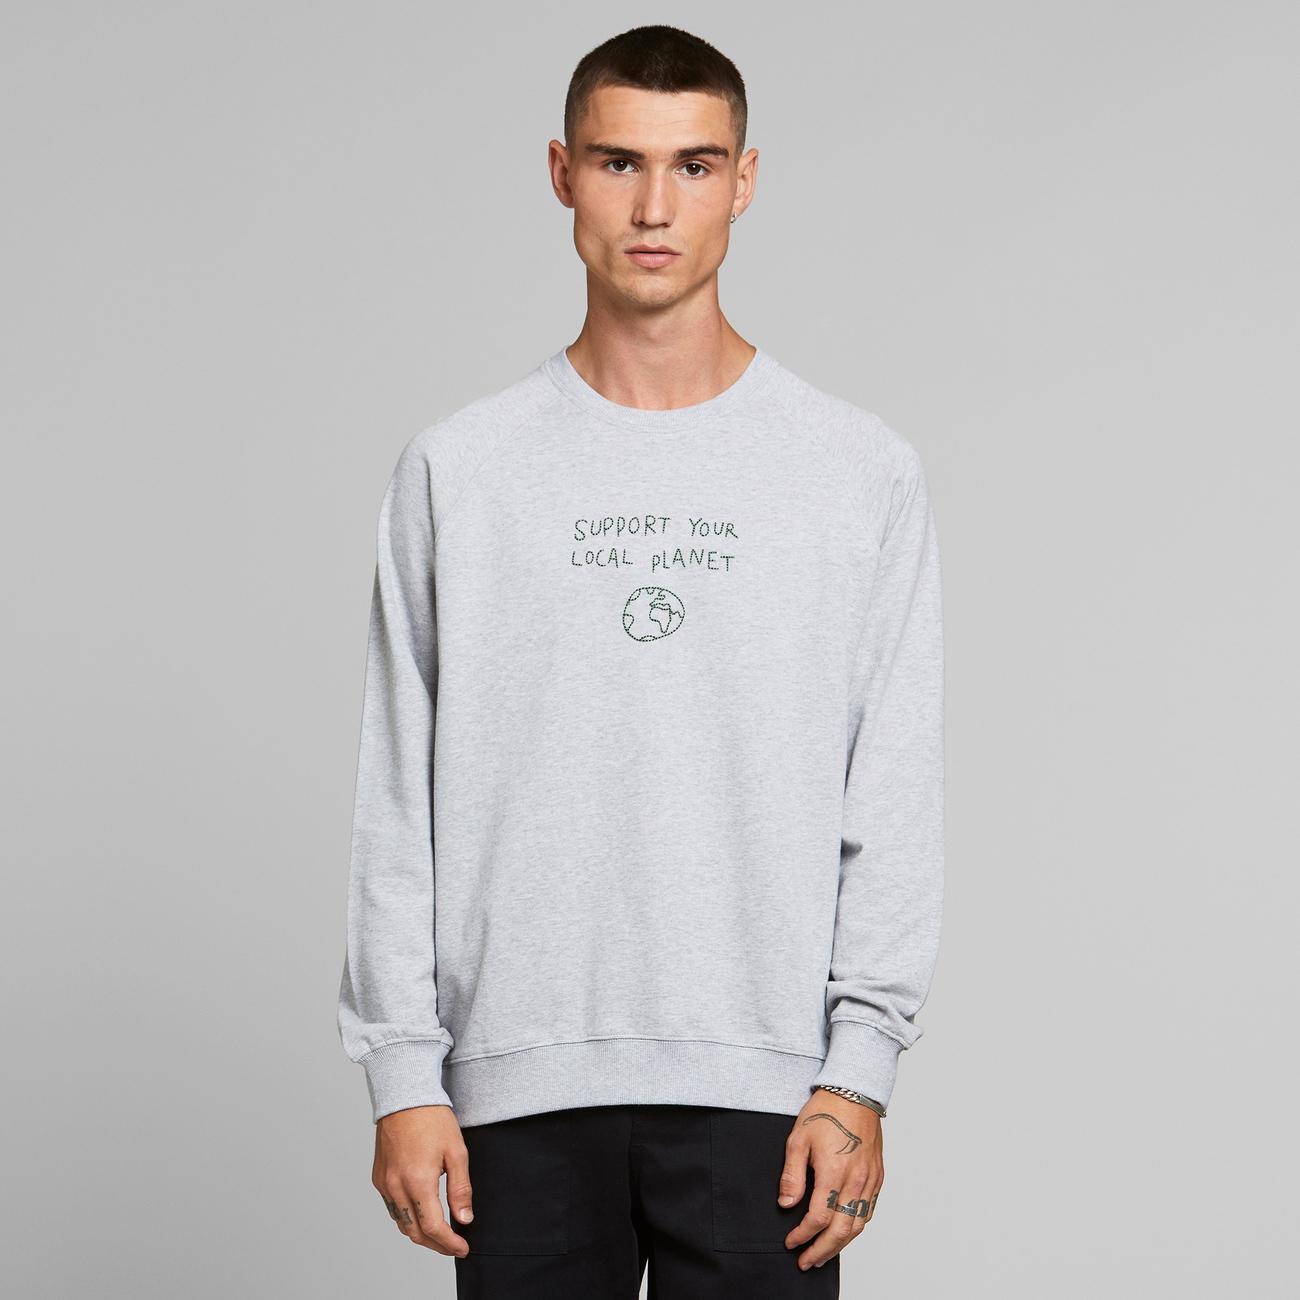 Sweatshirt Malmoe Local Planet Grey Melange